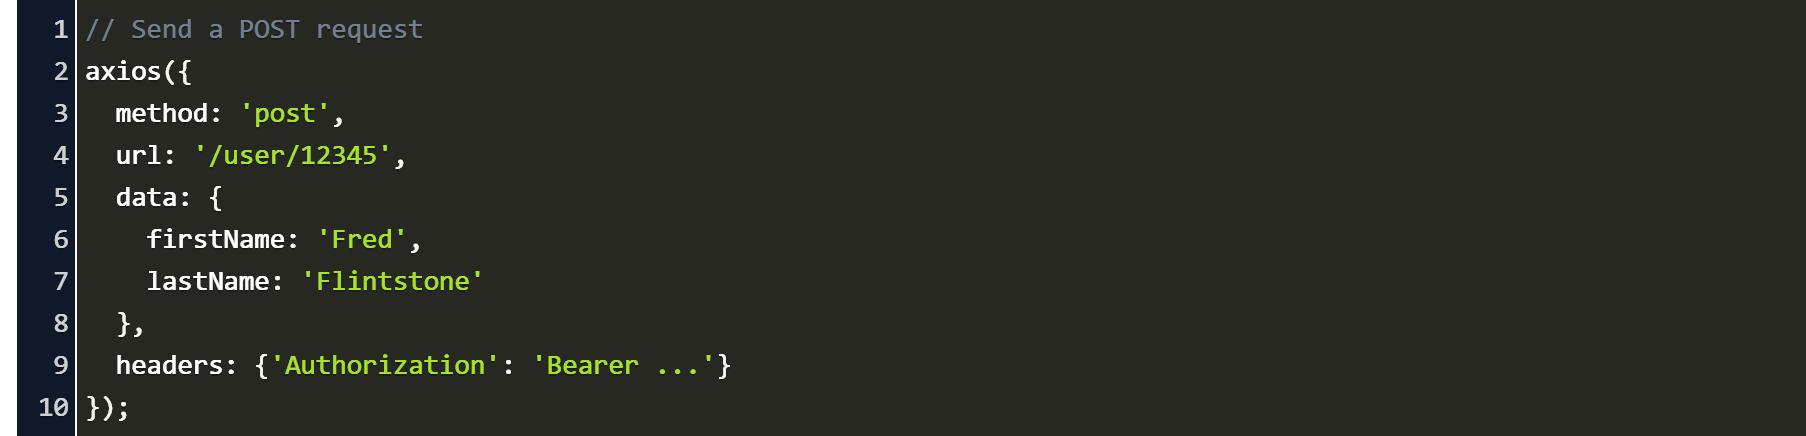 Axios Post Headers Code Example